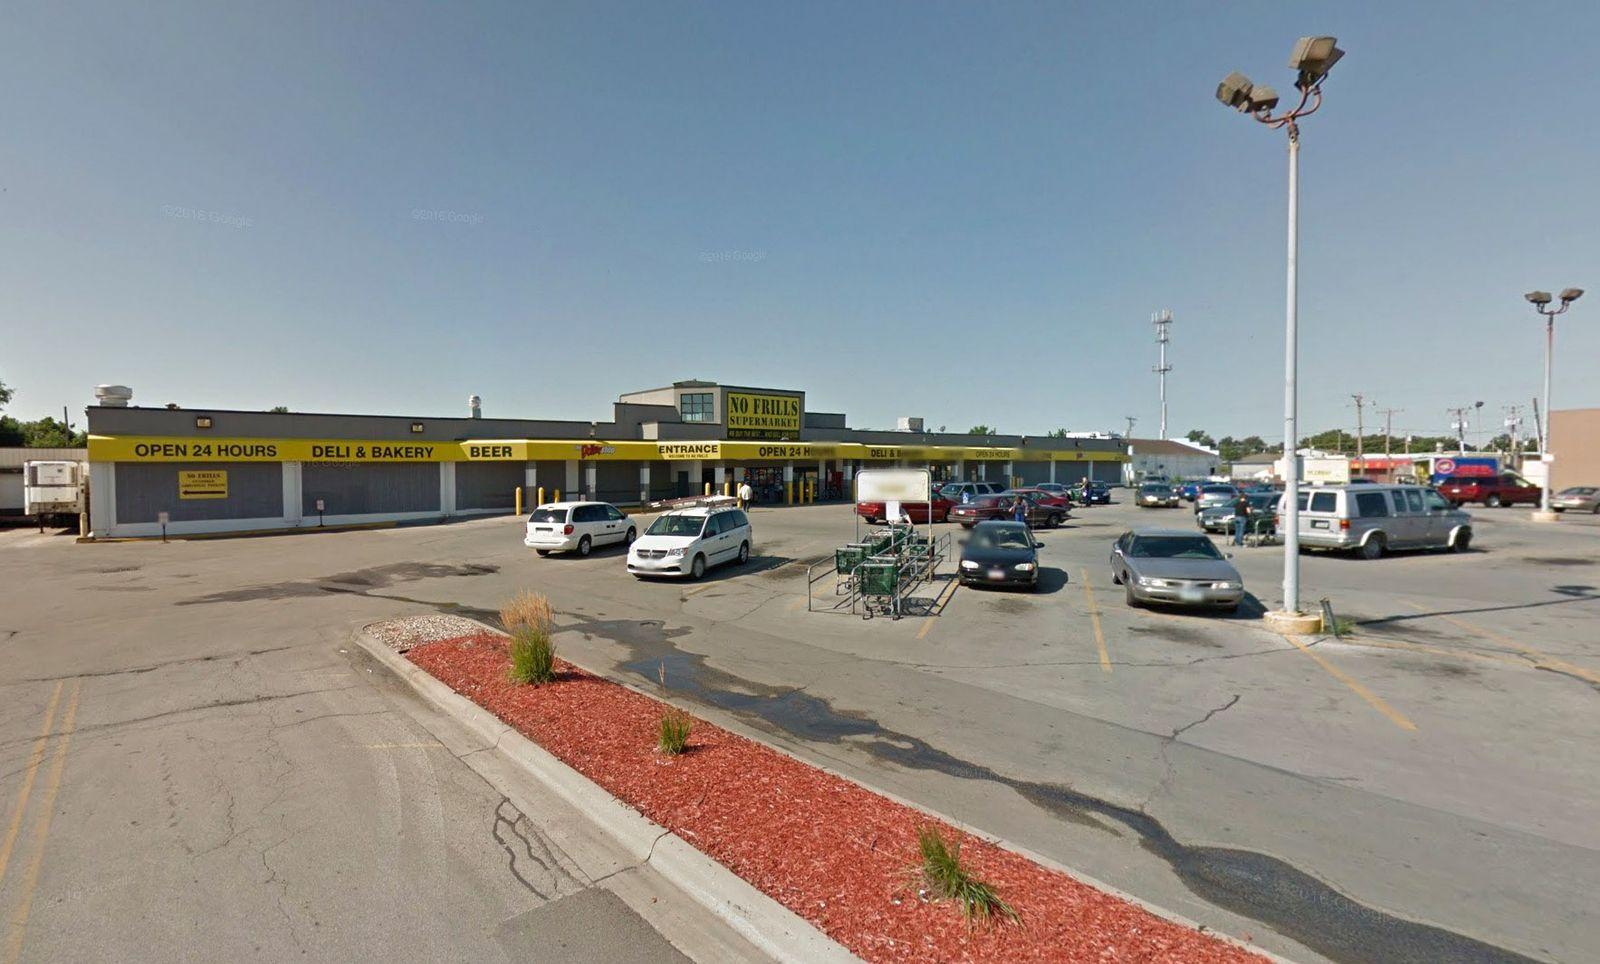 Iowa/ Council Bluffs/ No Frills Supermarket